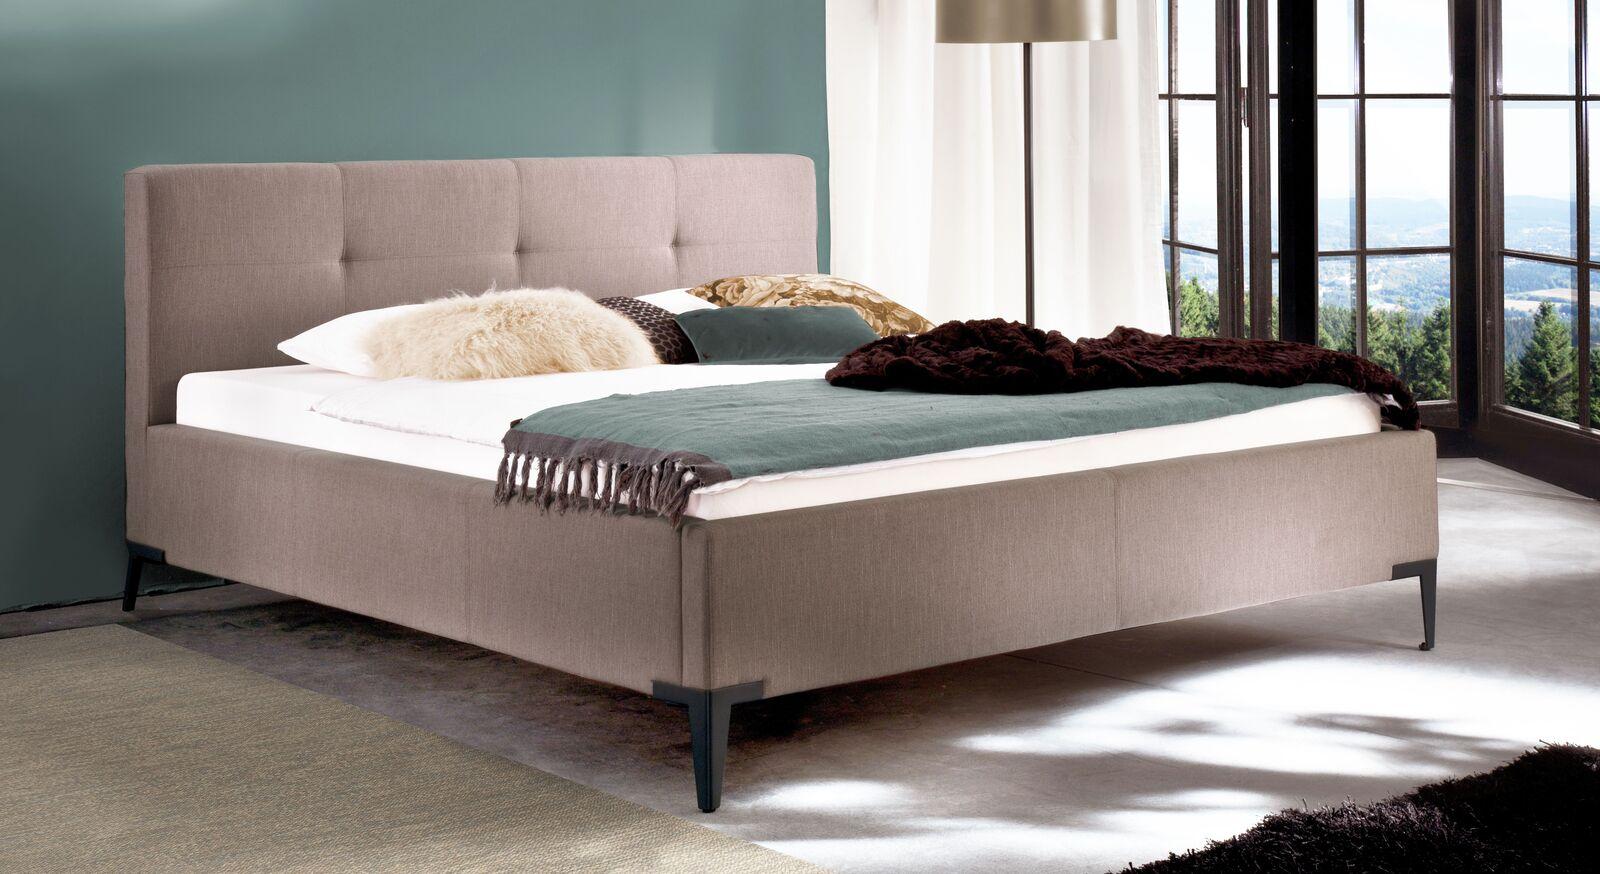 Bett Raritan aus Webstoff in Altrosa